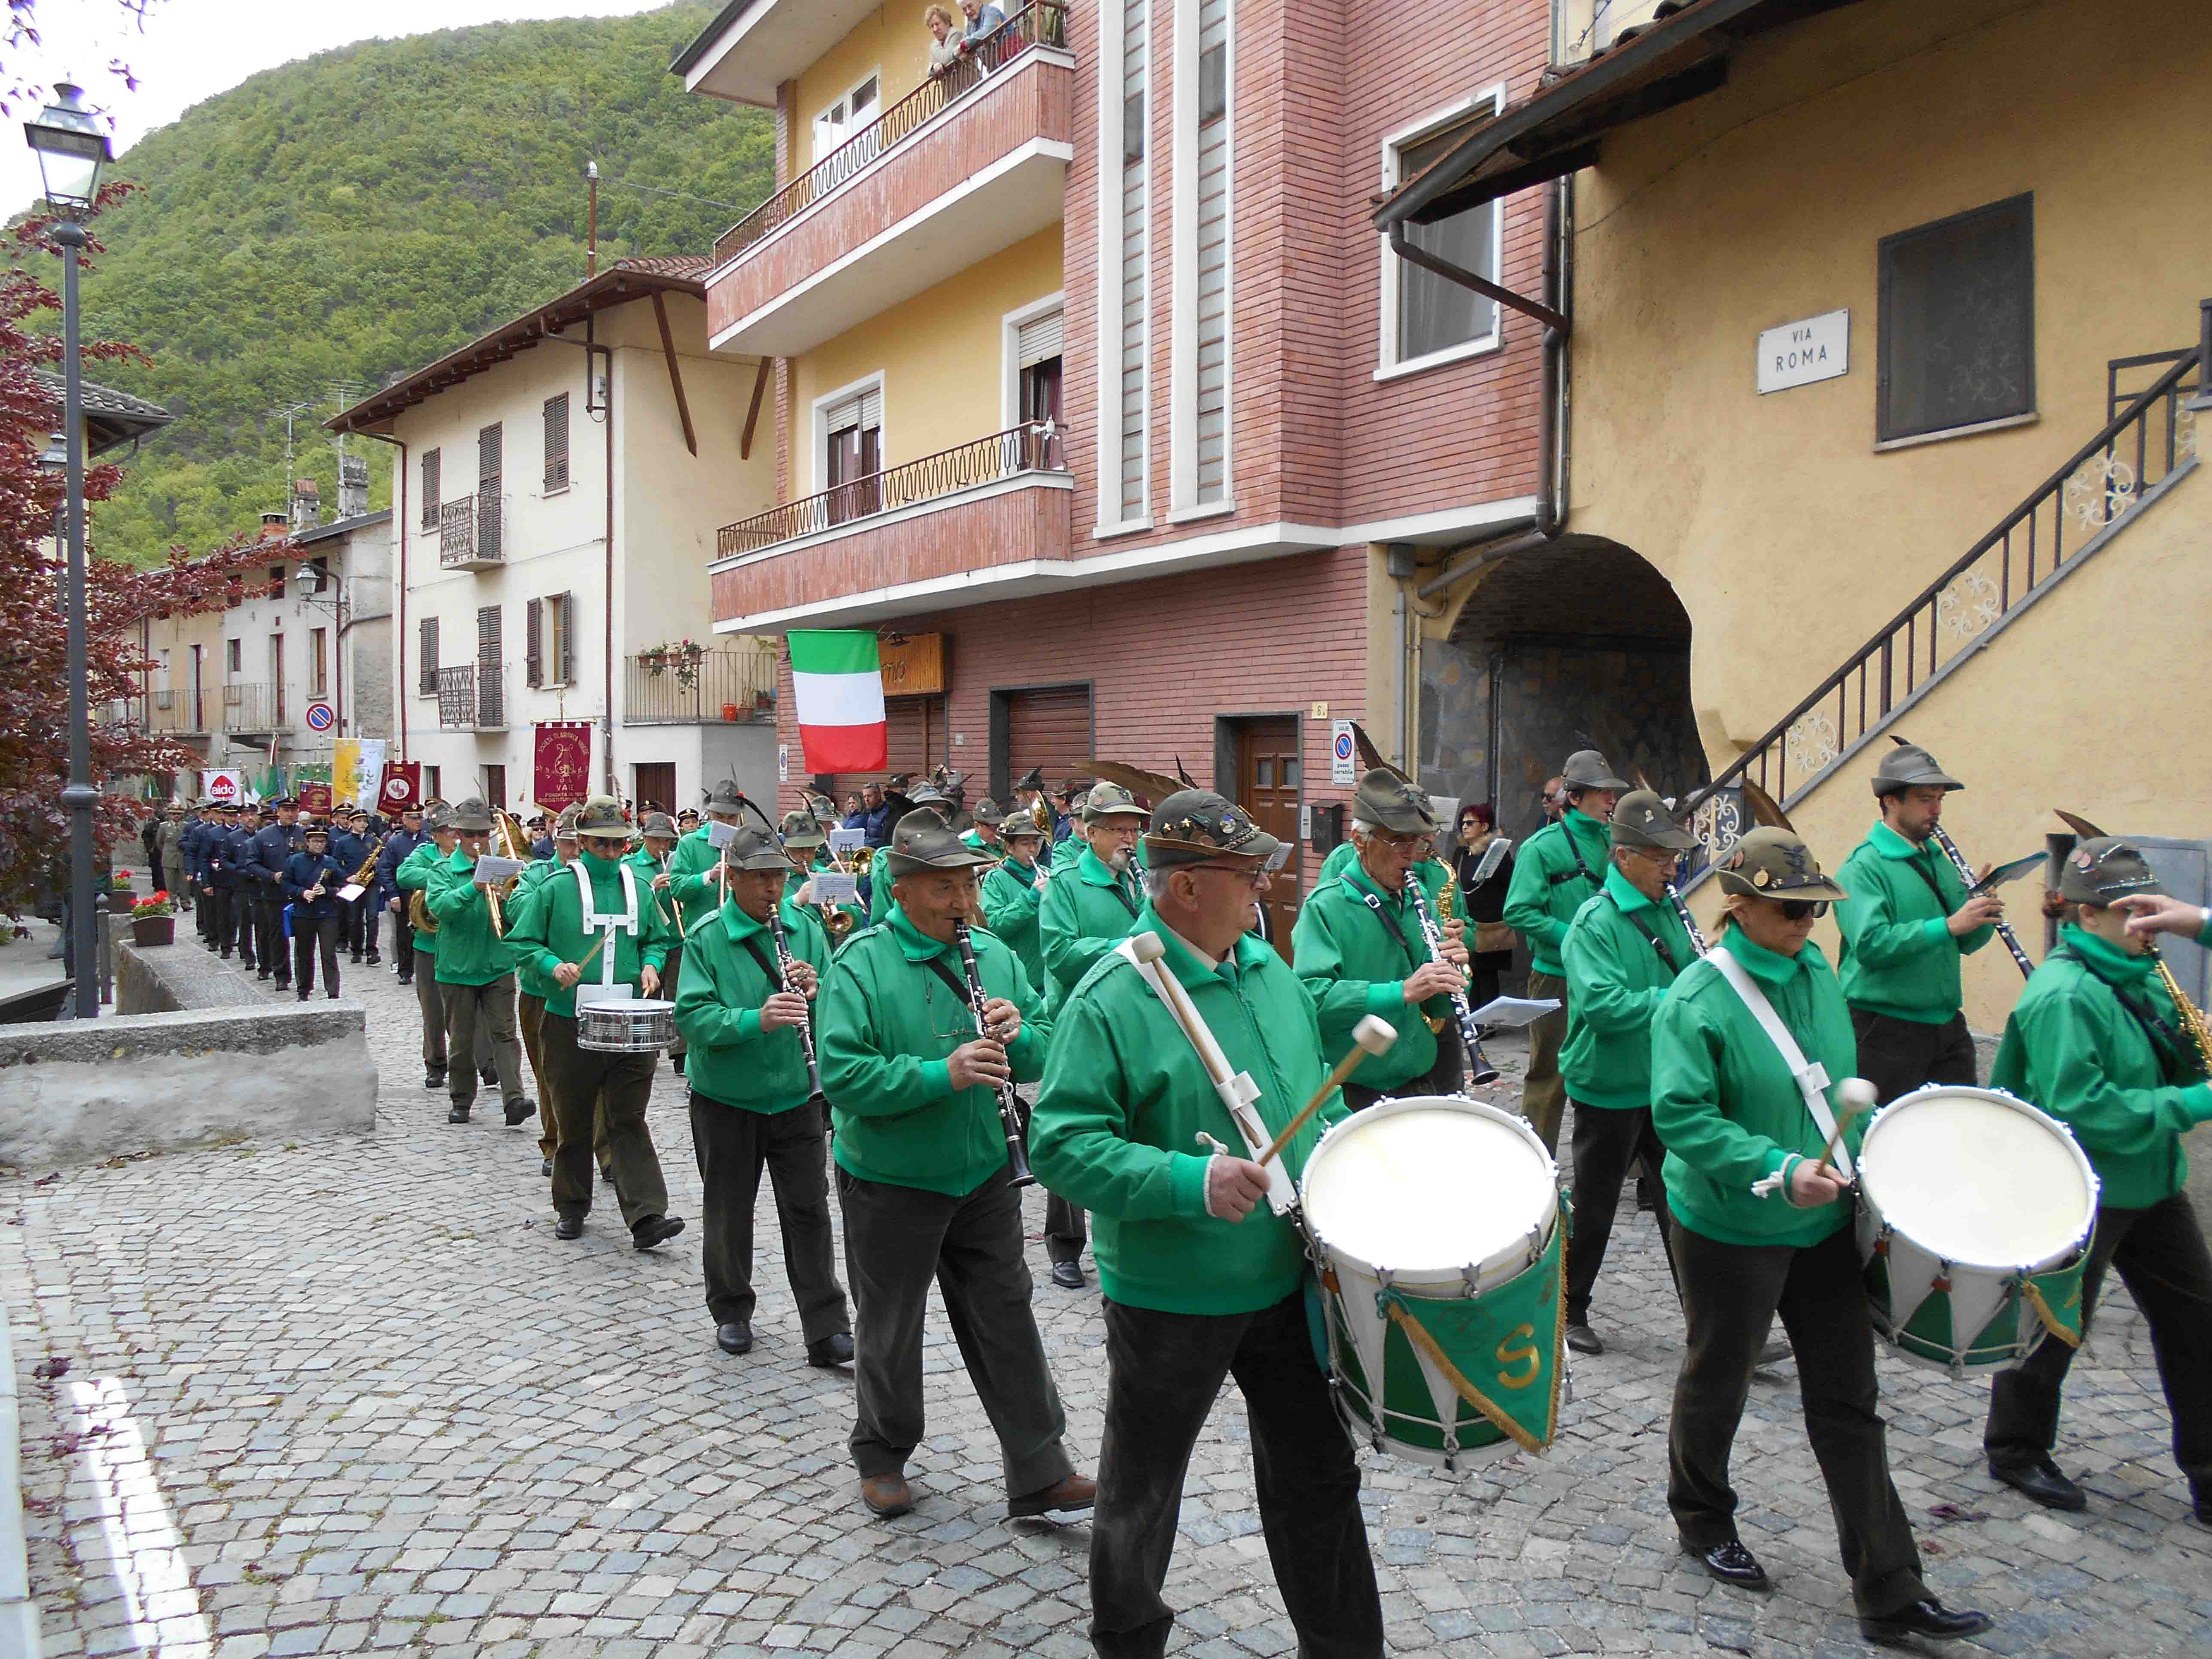 La sfilata a Vaie Fanfara Ana Valsusa (90 anni Alpini Vaie)